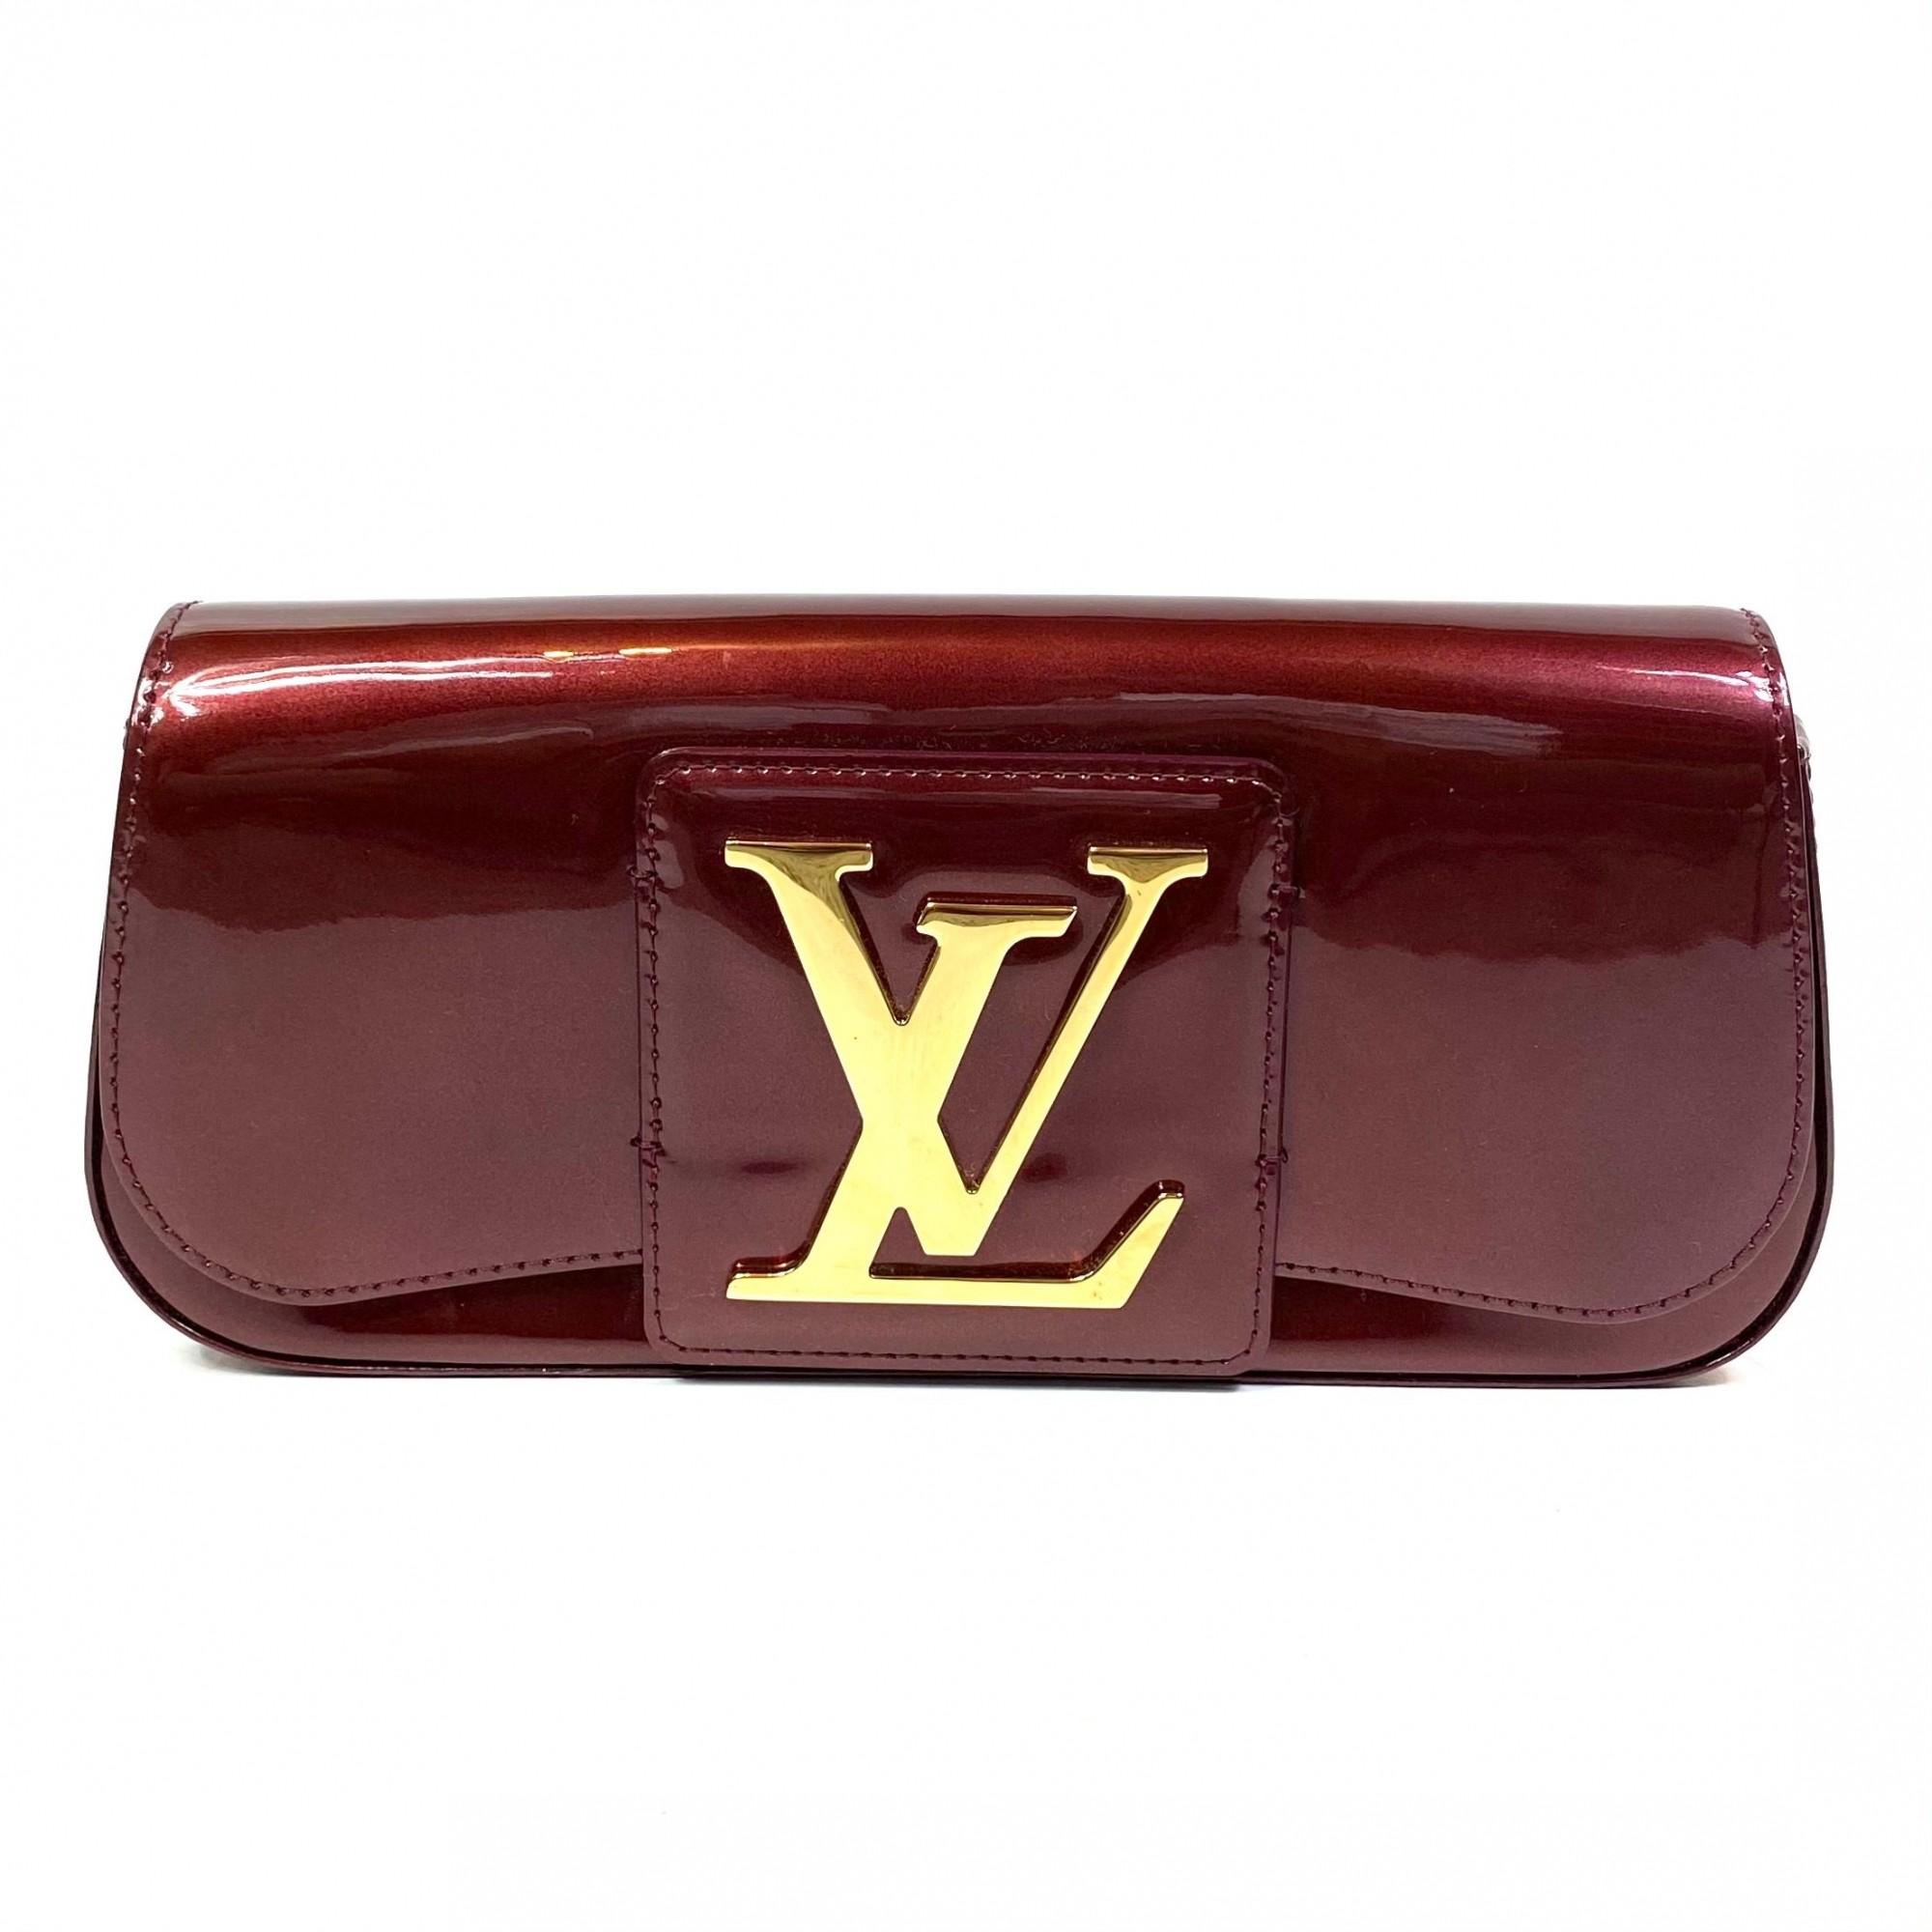 Bolsa Clutch Louis Vuitton Sobe Verniz Vinho